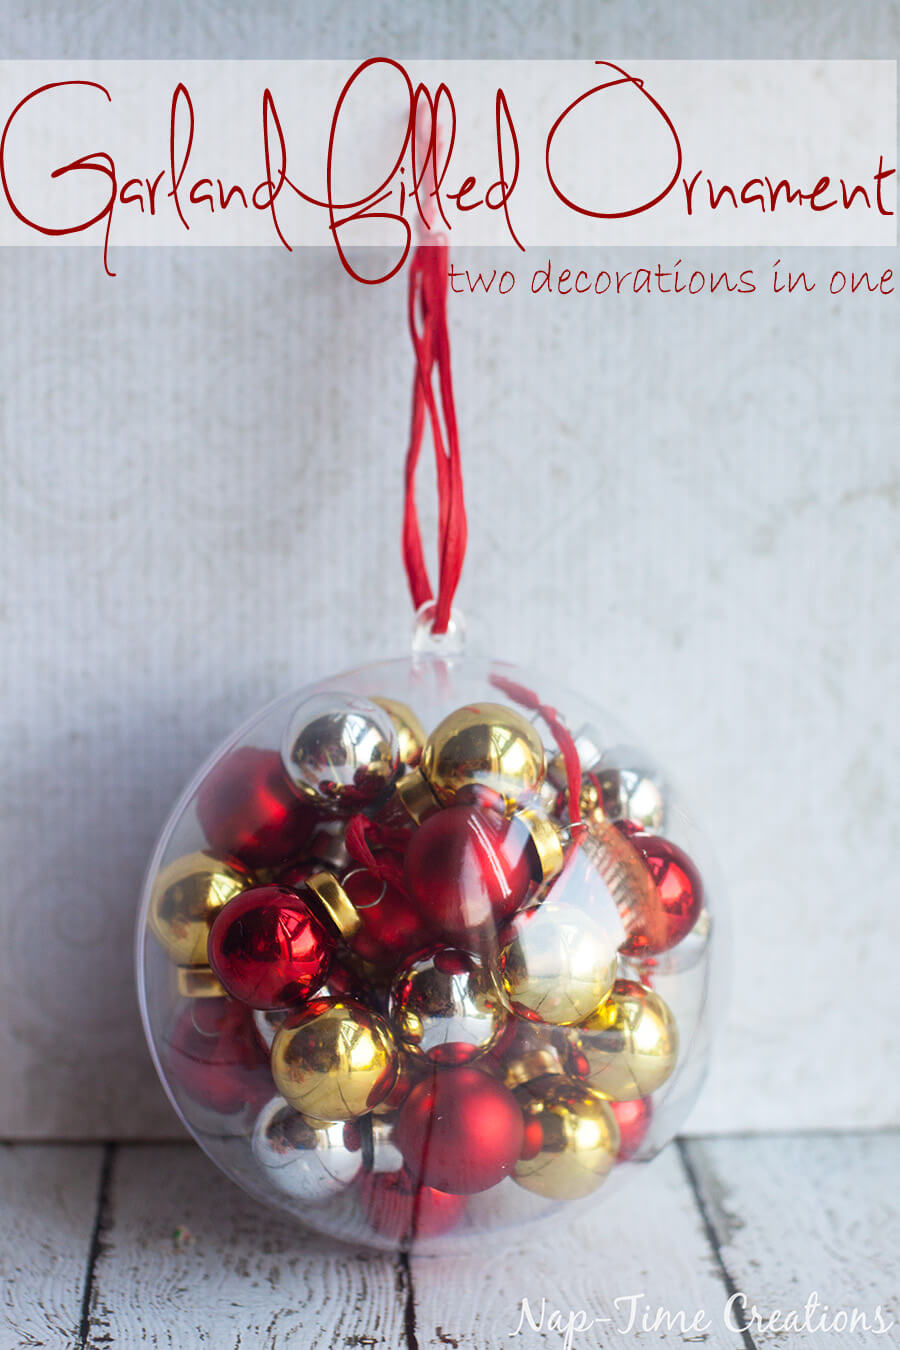 fun filled ornament ideas